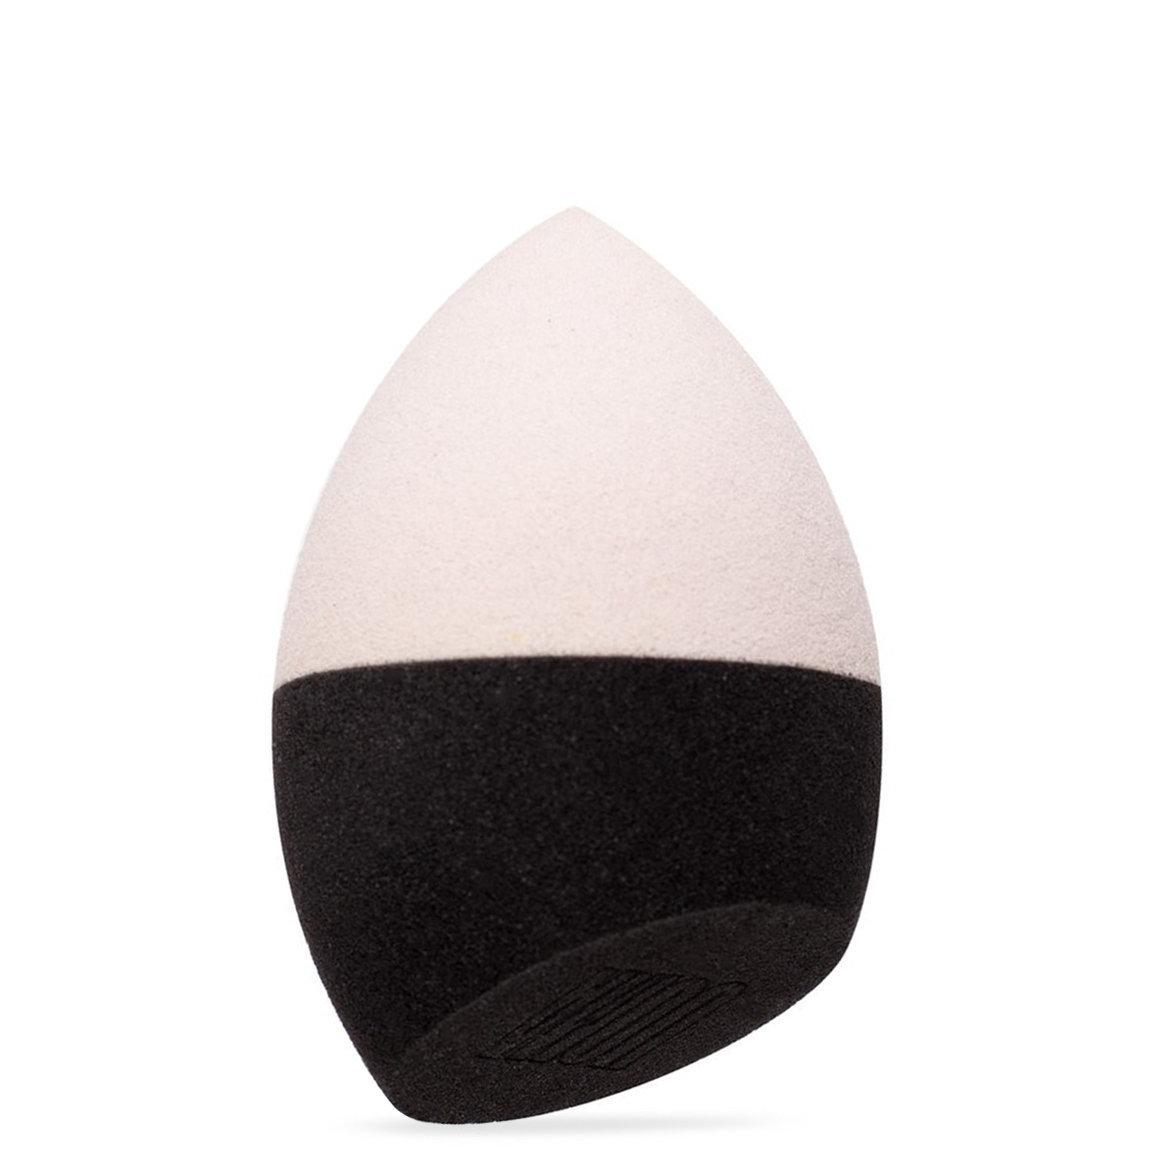 UOMA Beauty Big Head! Dual Density Sponge alternative view 1 - product swatch.